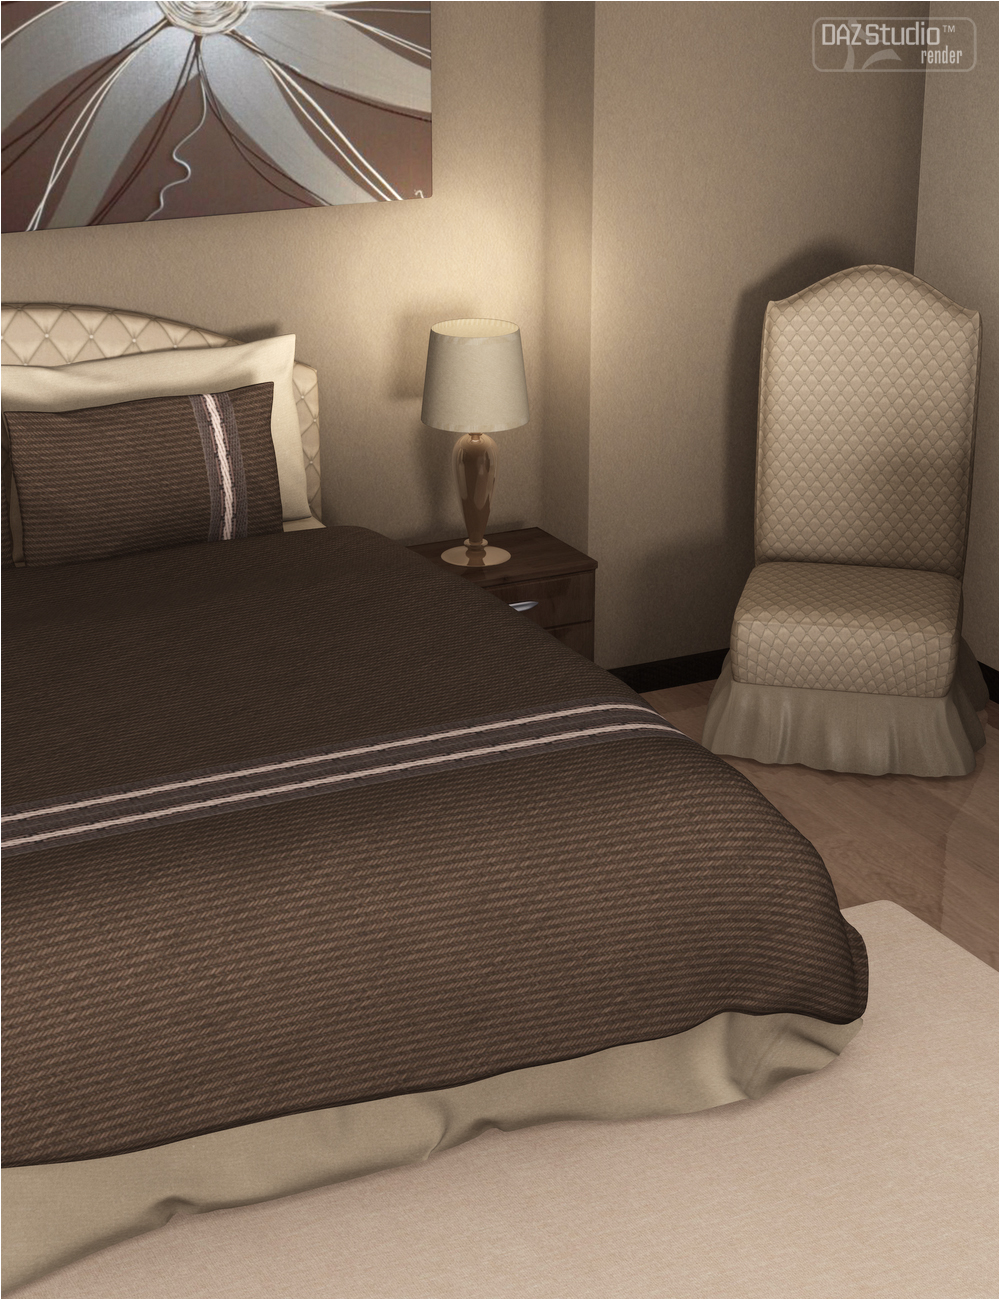 Designer for Luxury Bedroom by: OziChick, 3D Models by Daz 3D